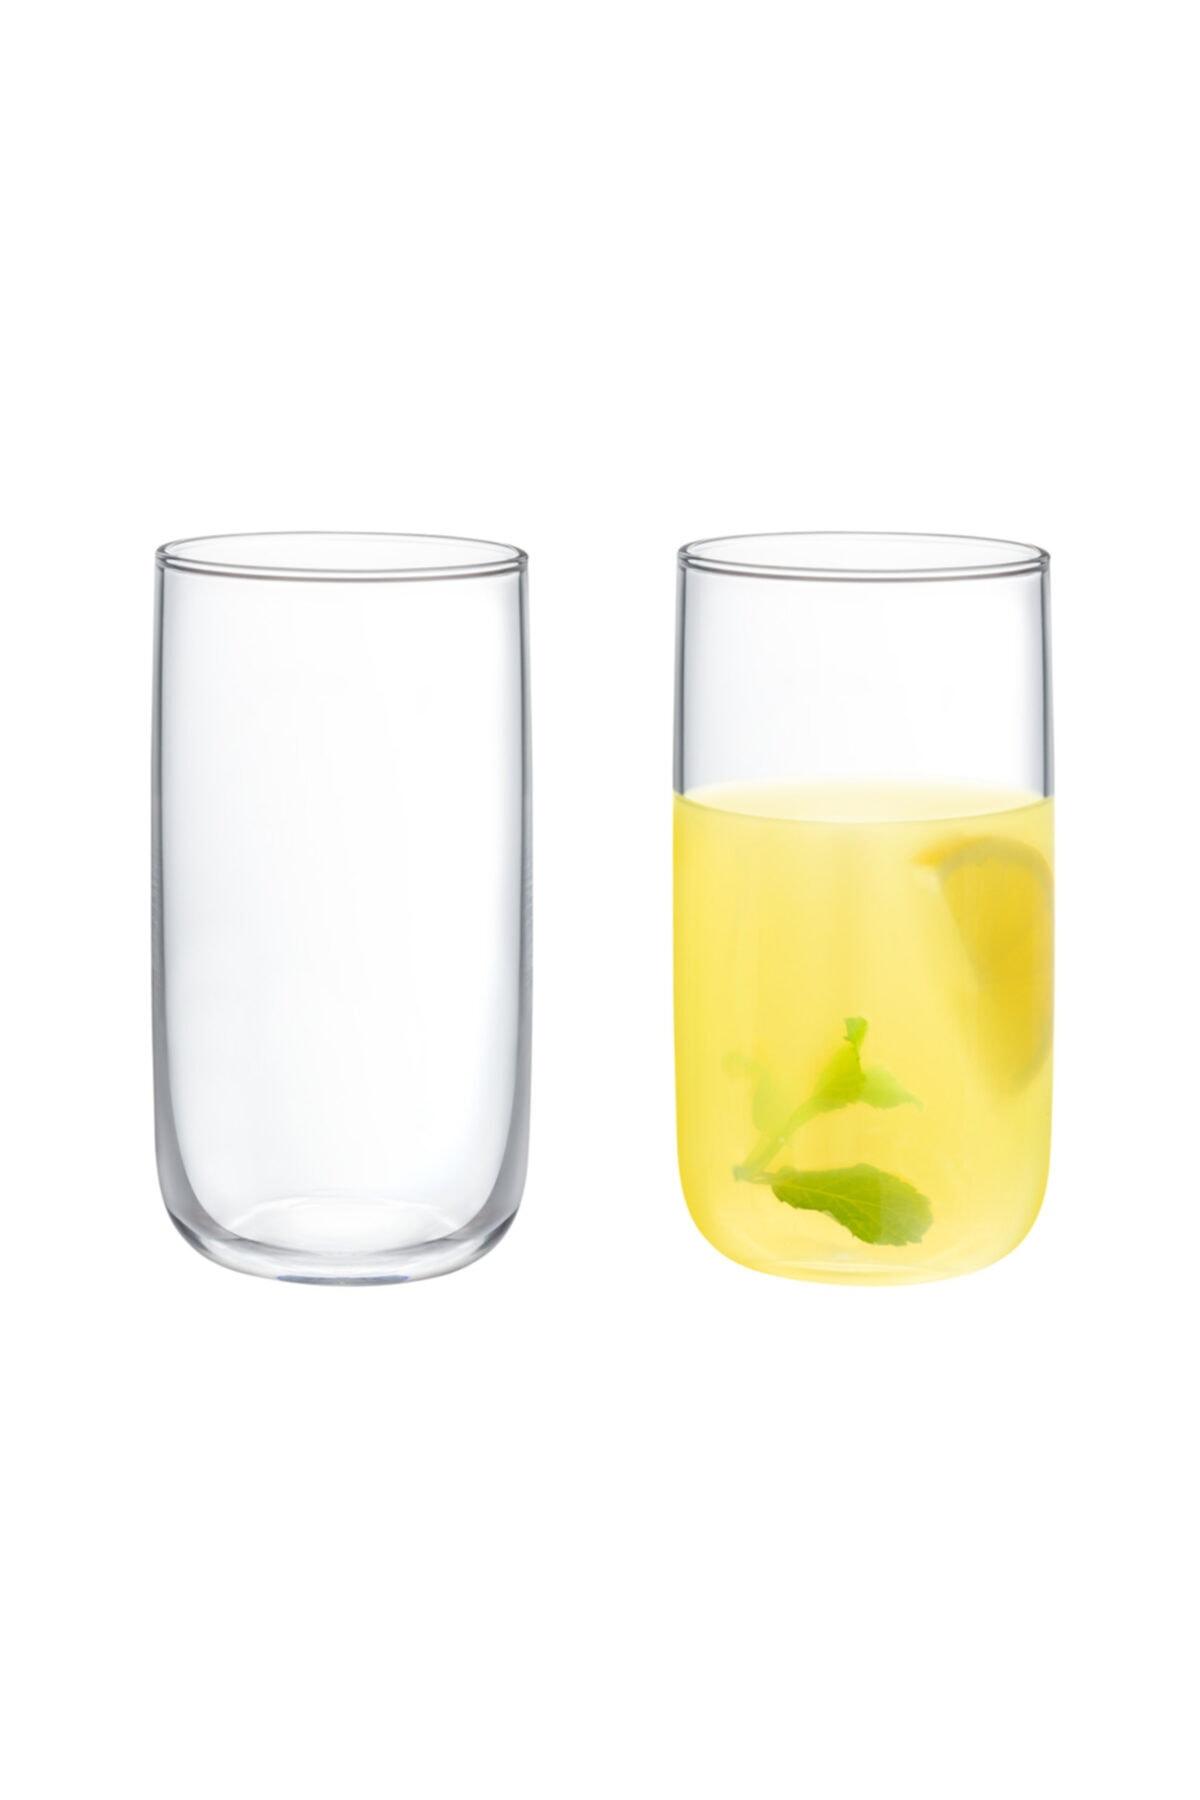 Madame Coco Musette 4'lü Meşrubat Bardağı Seti 2